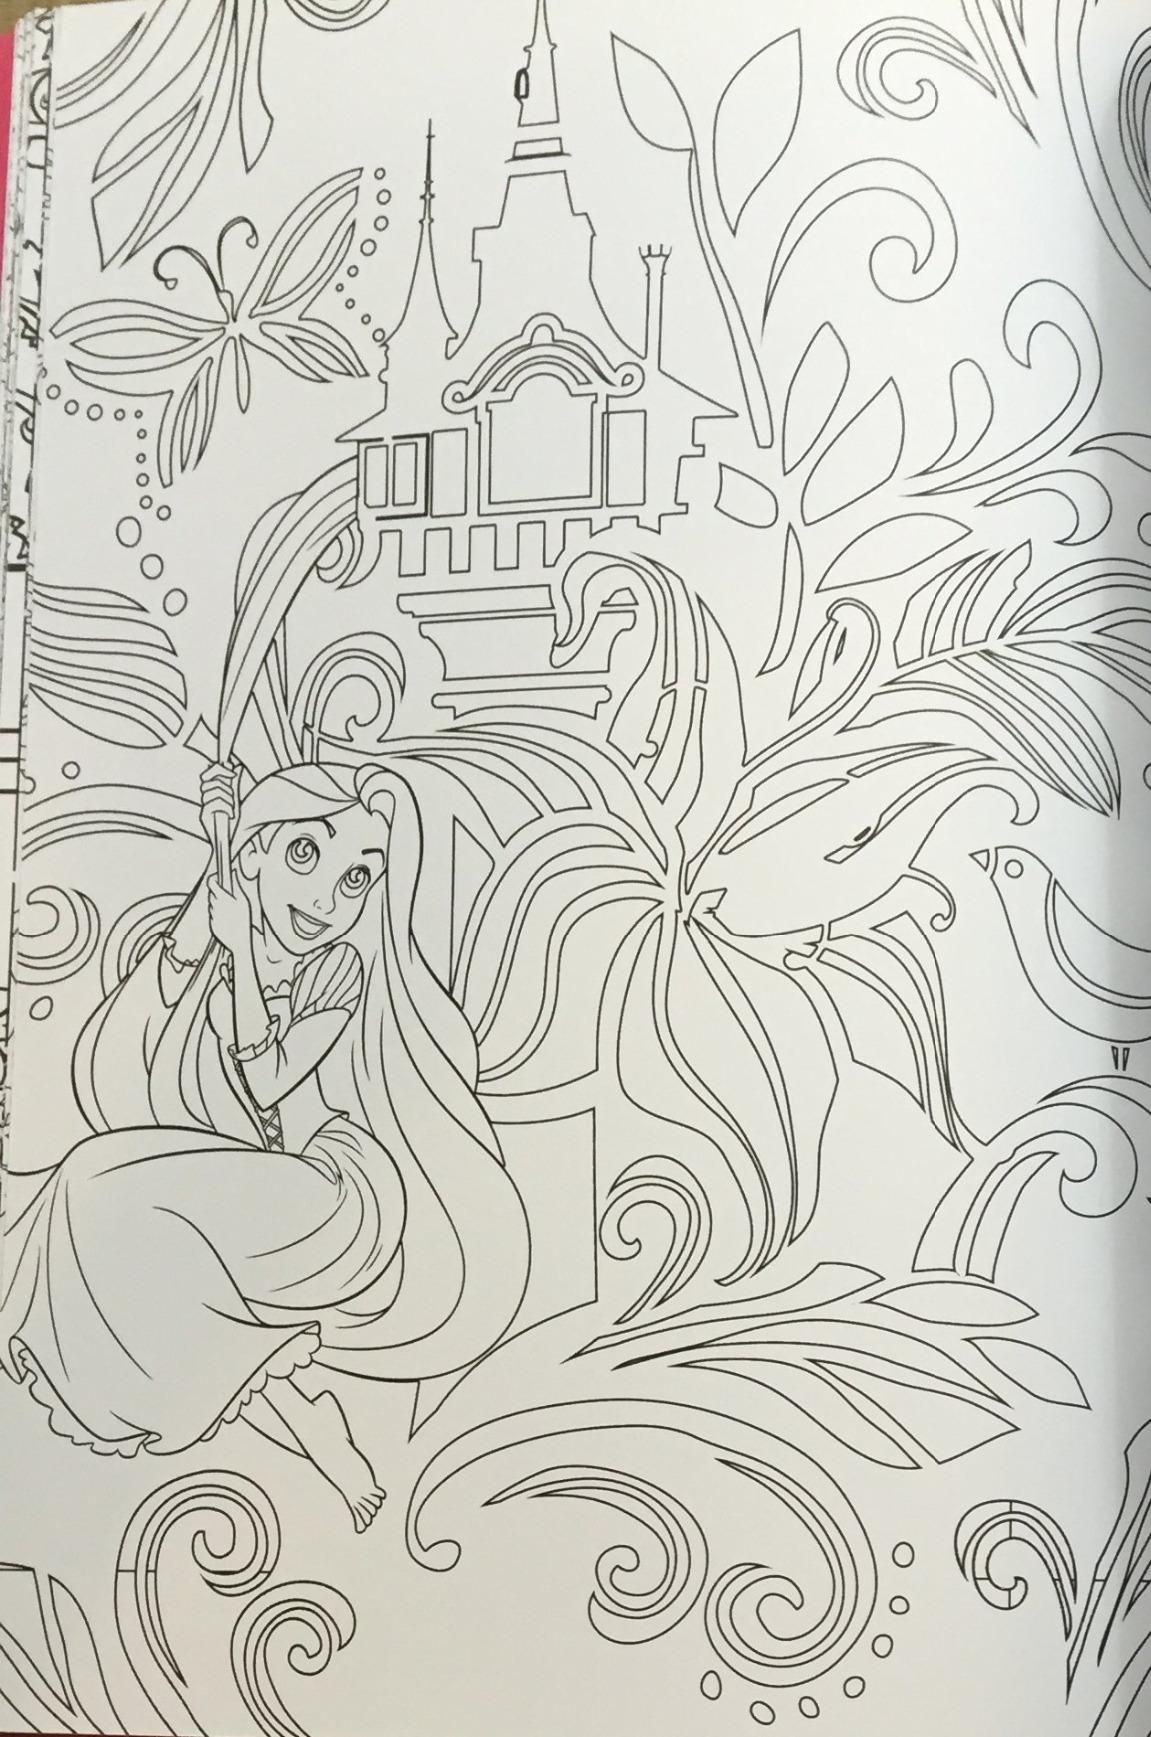 Amazon Iiiireaders Review Of Art Coloring Disney Princess 100 Image